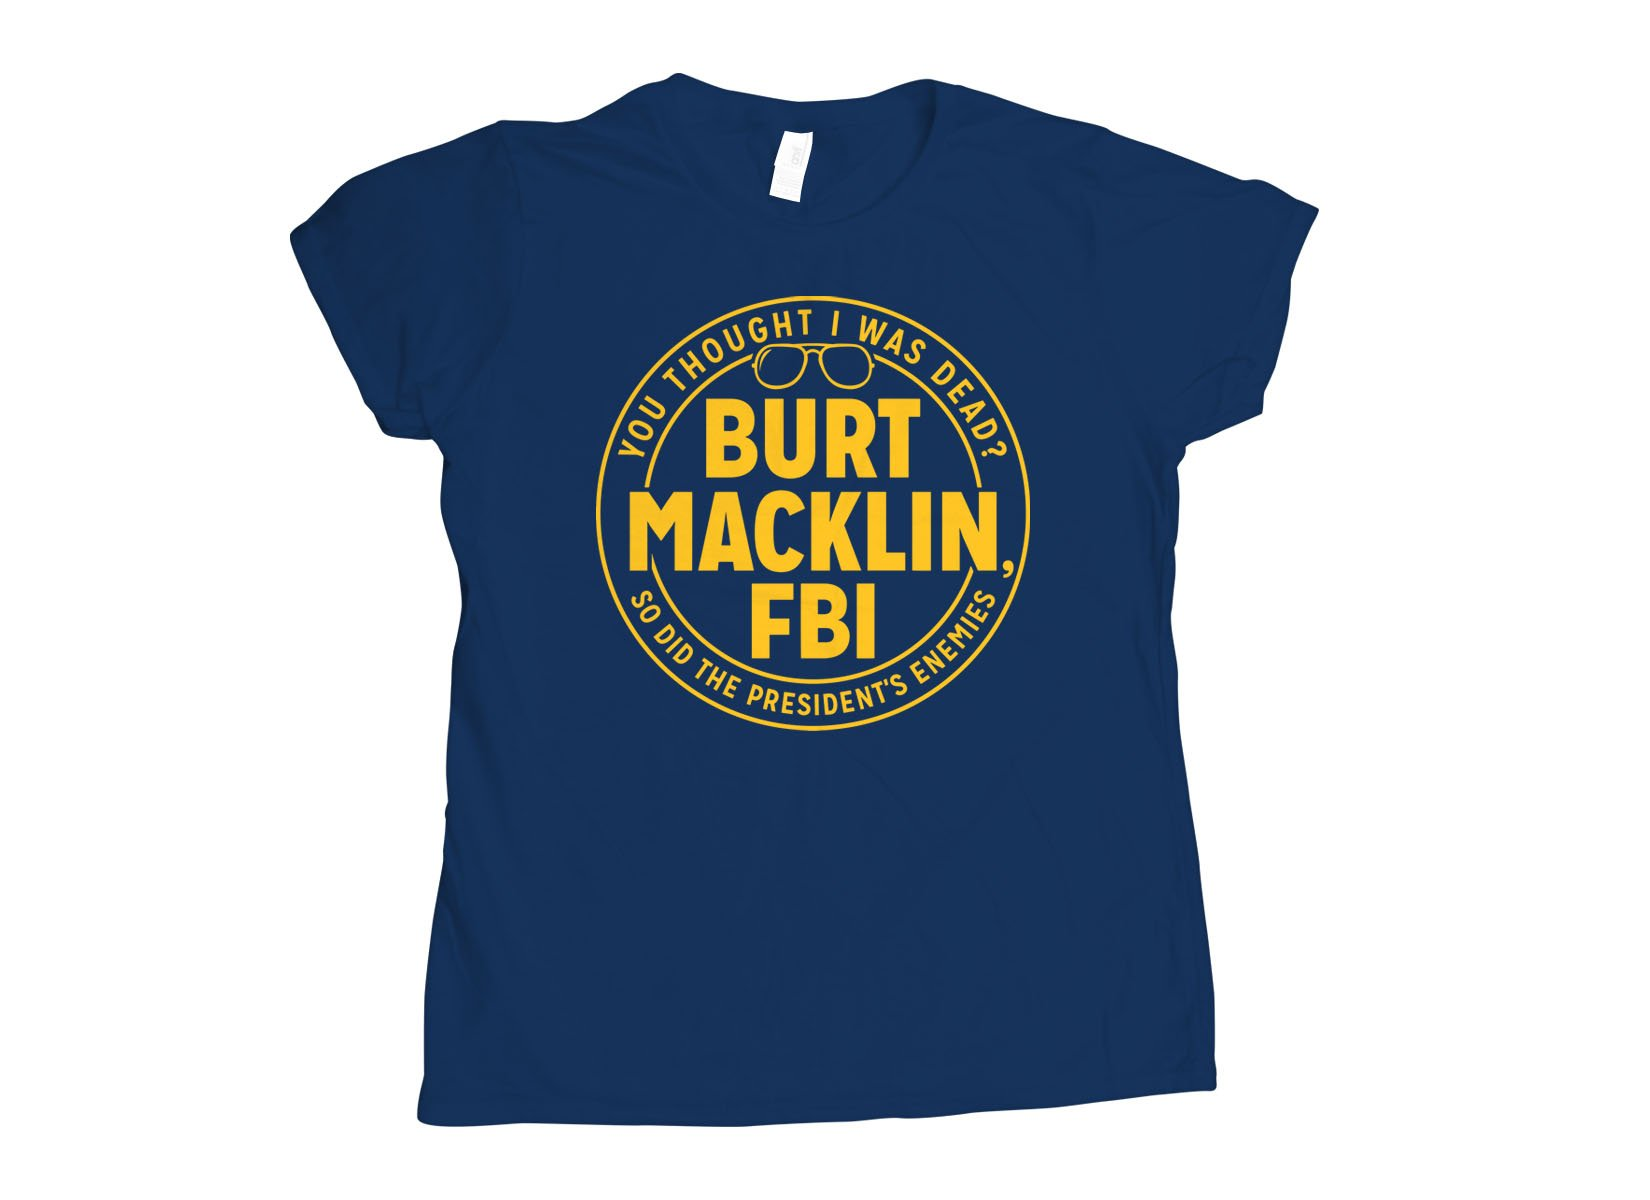 Burt Macklin, FBI on Womens T-Shirt